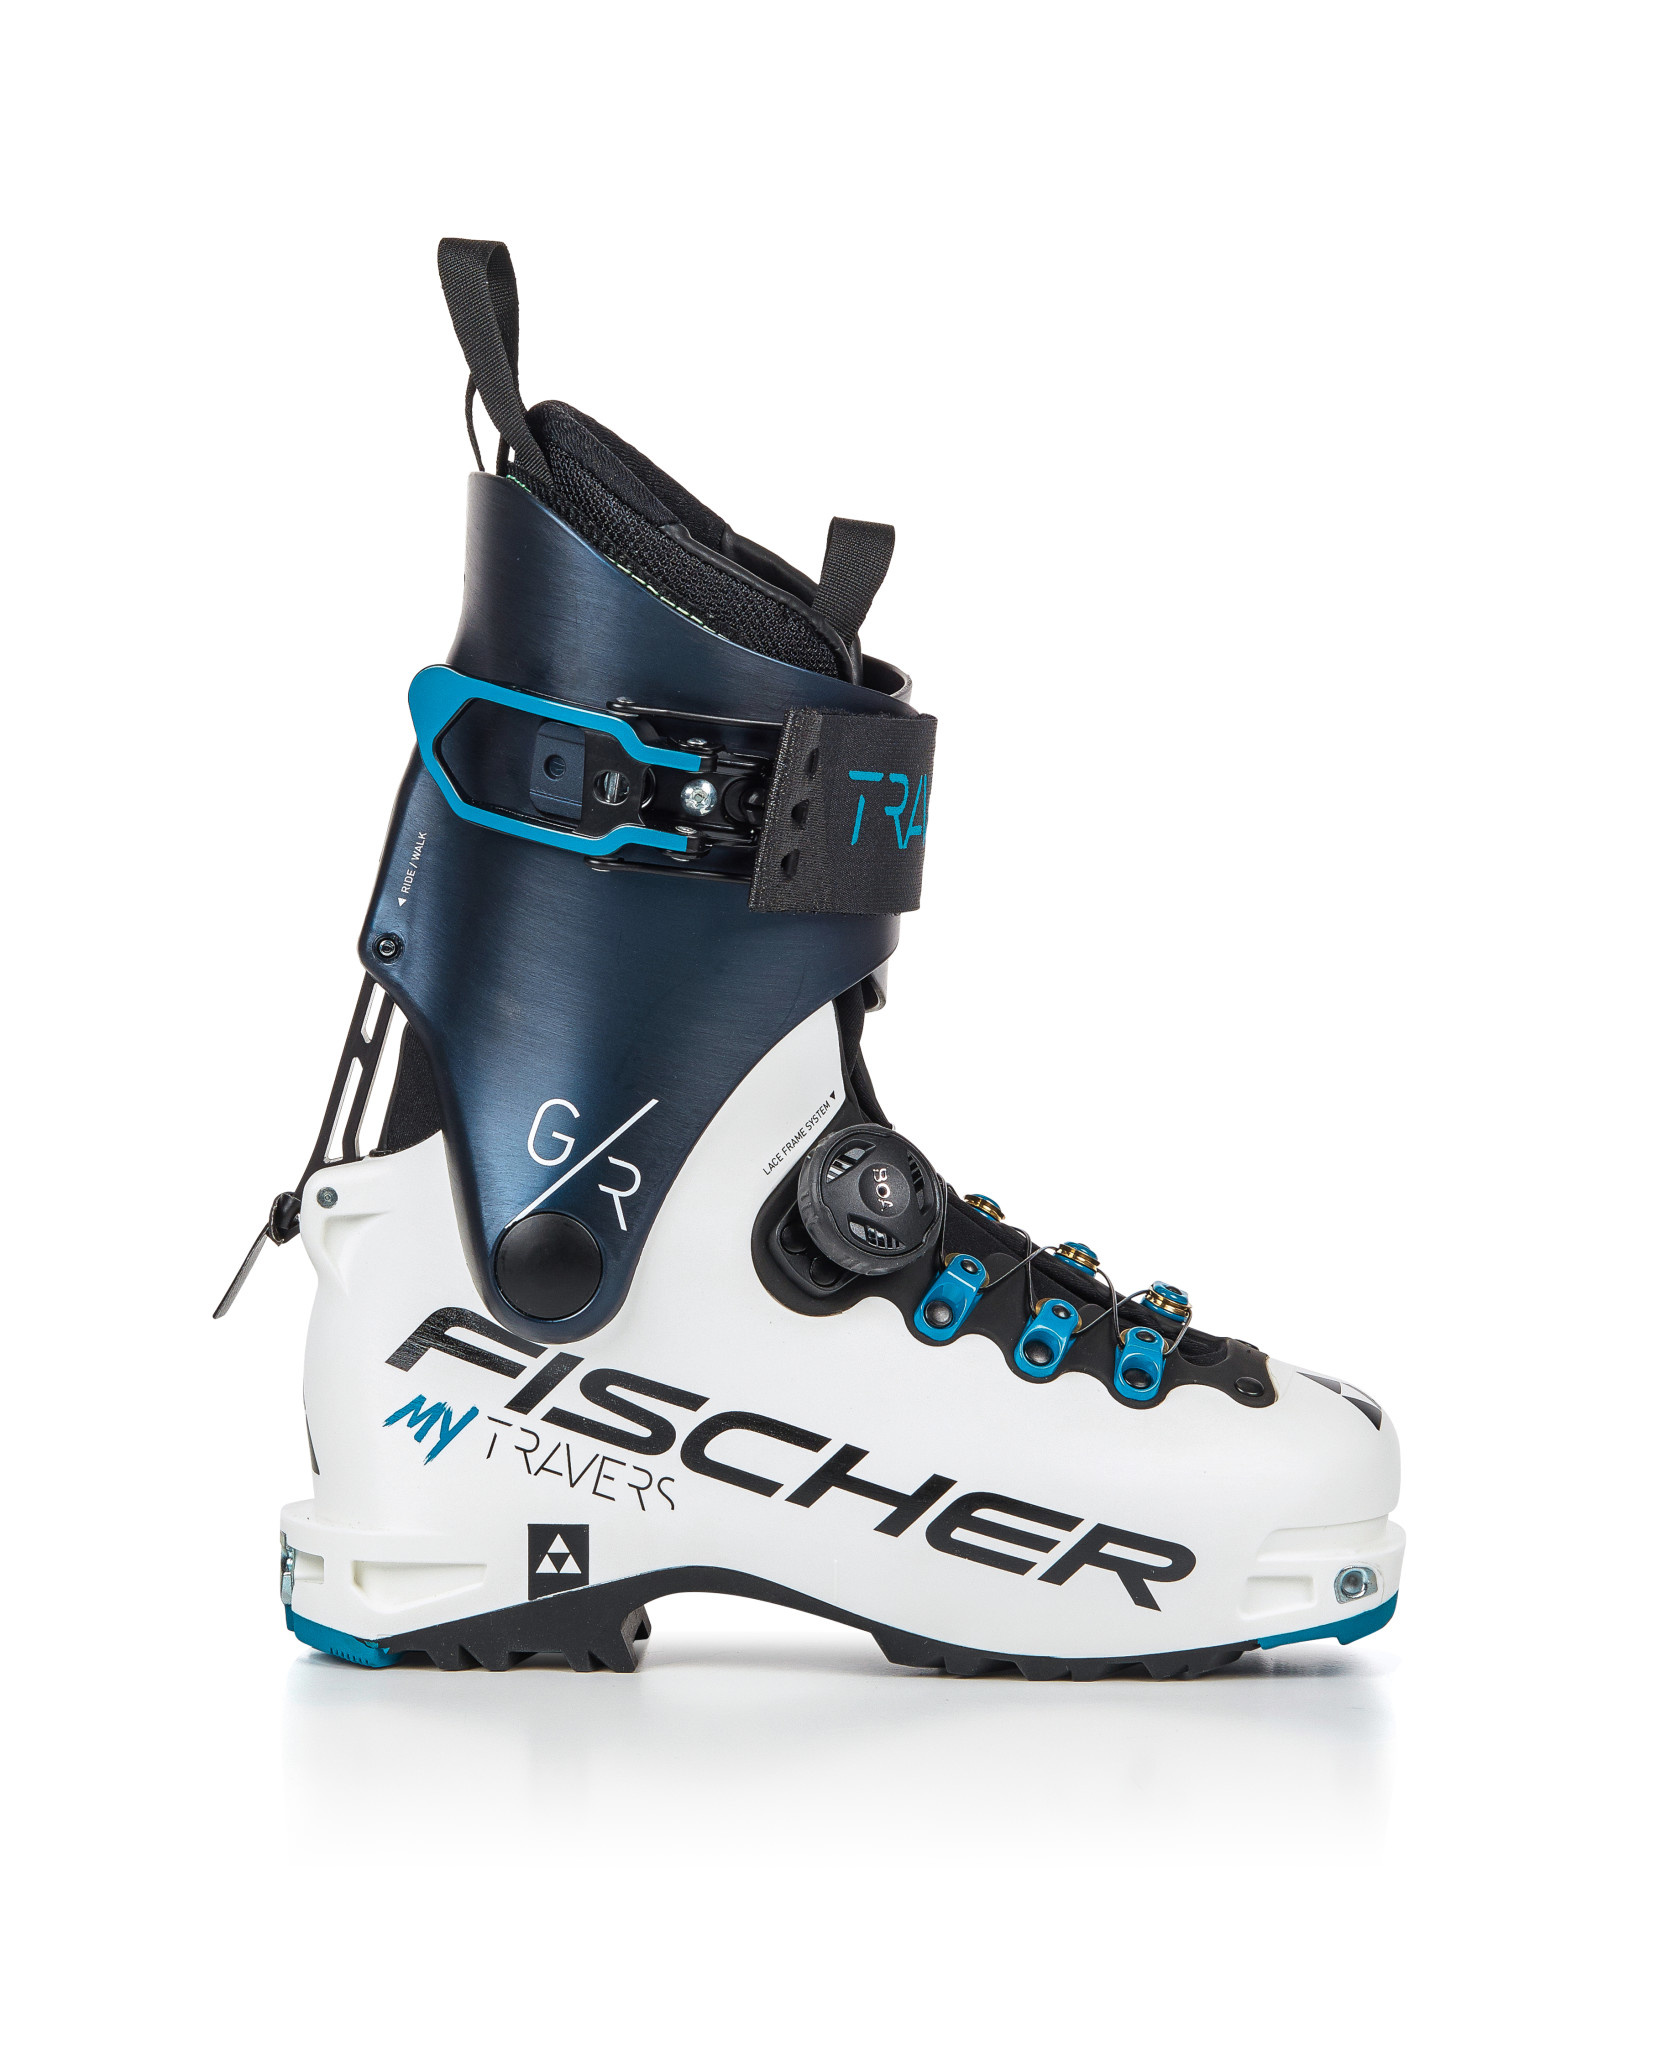 Bottes Alpine Fischer MY Travers GR Femme Blanc/Bleu Nuit